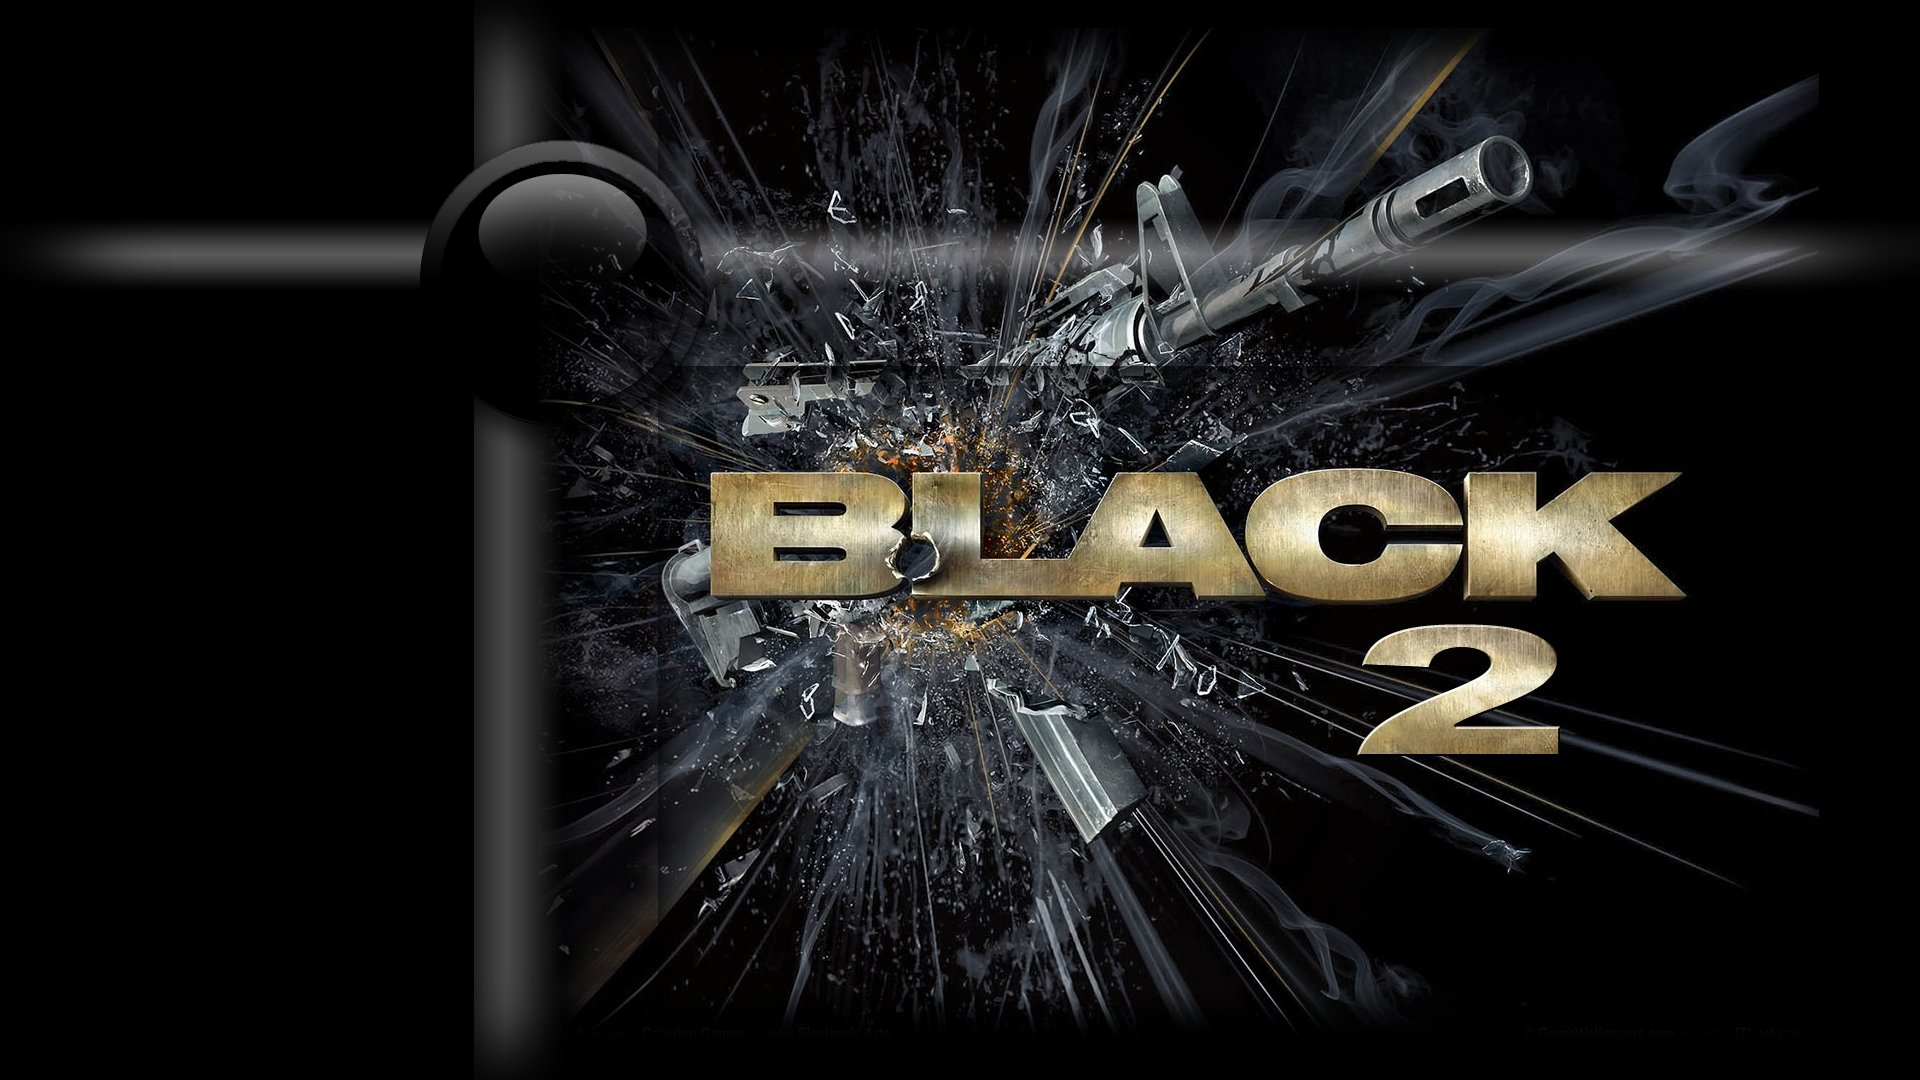 Black Game Ps2 HD wallpaper 1920x1080